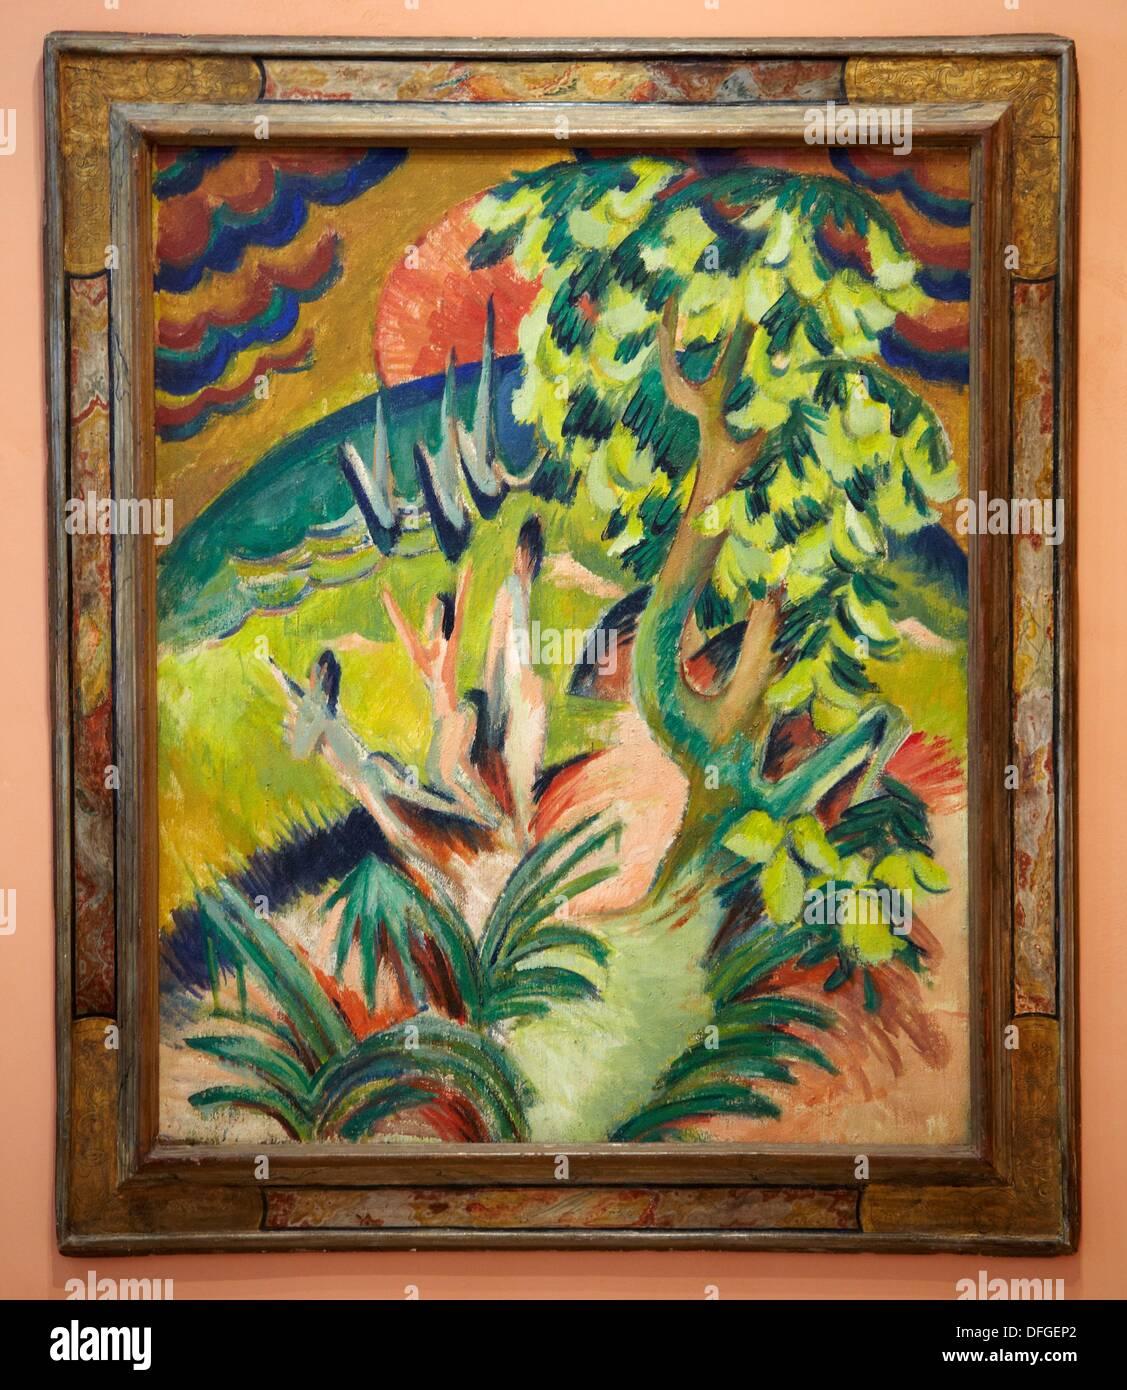 ´Curving Bay´, 1914, Ernst Ludwig Kirchner, Thyssen Bornemisza Museum, Madrid, Spain - Stock Image